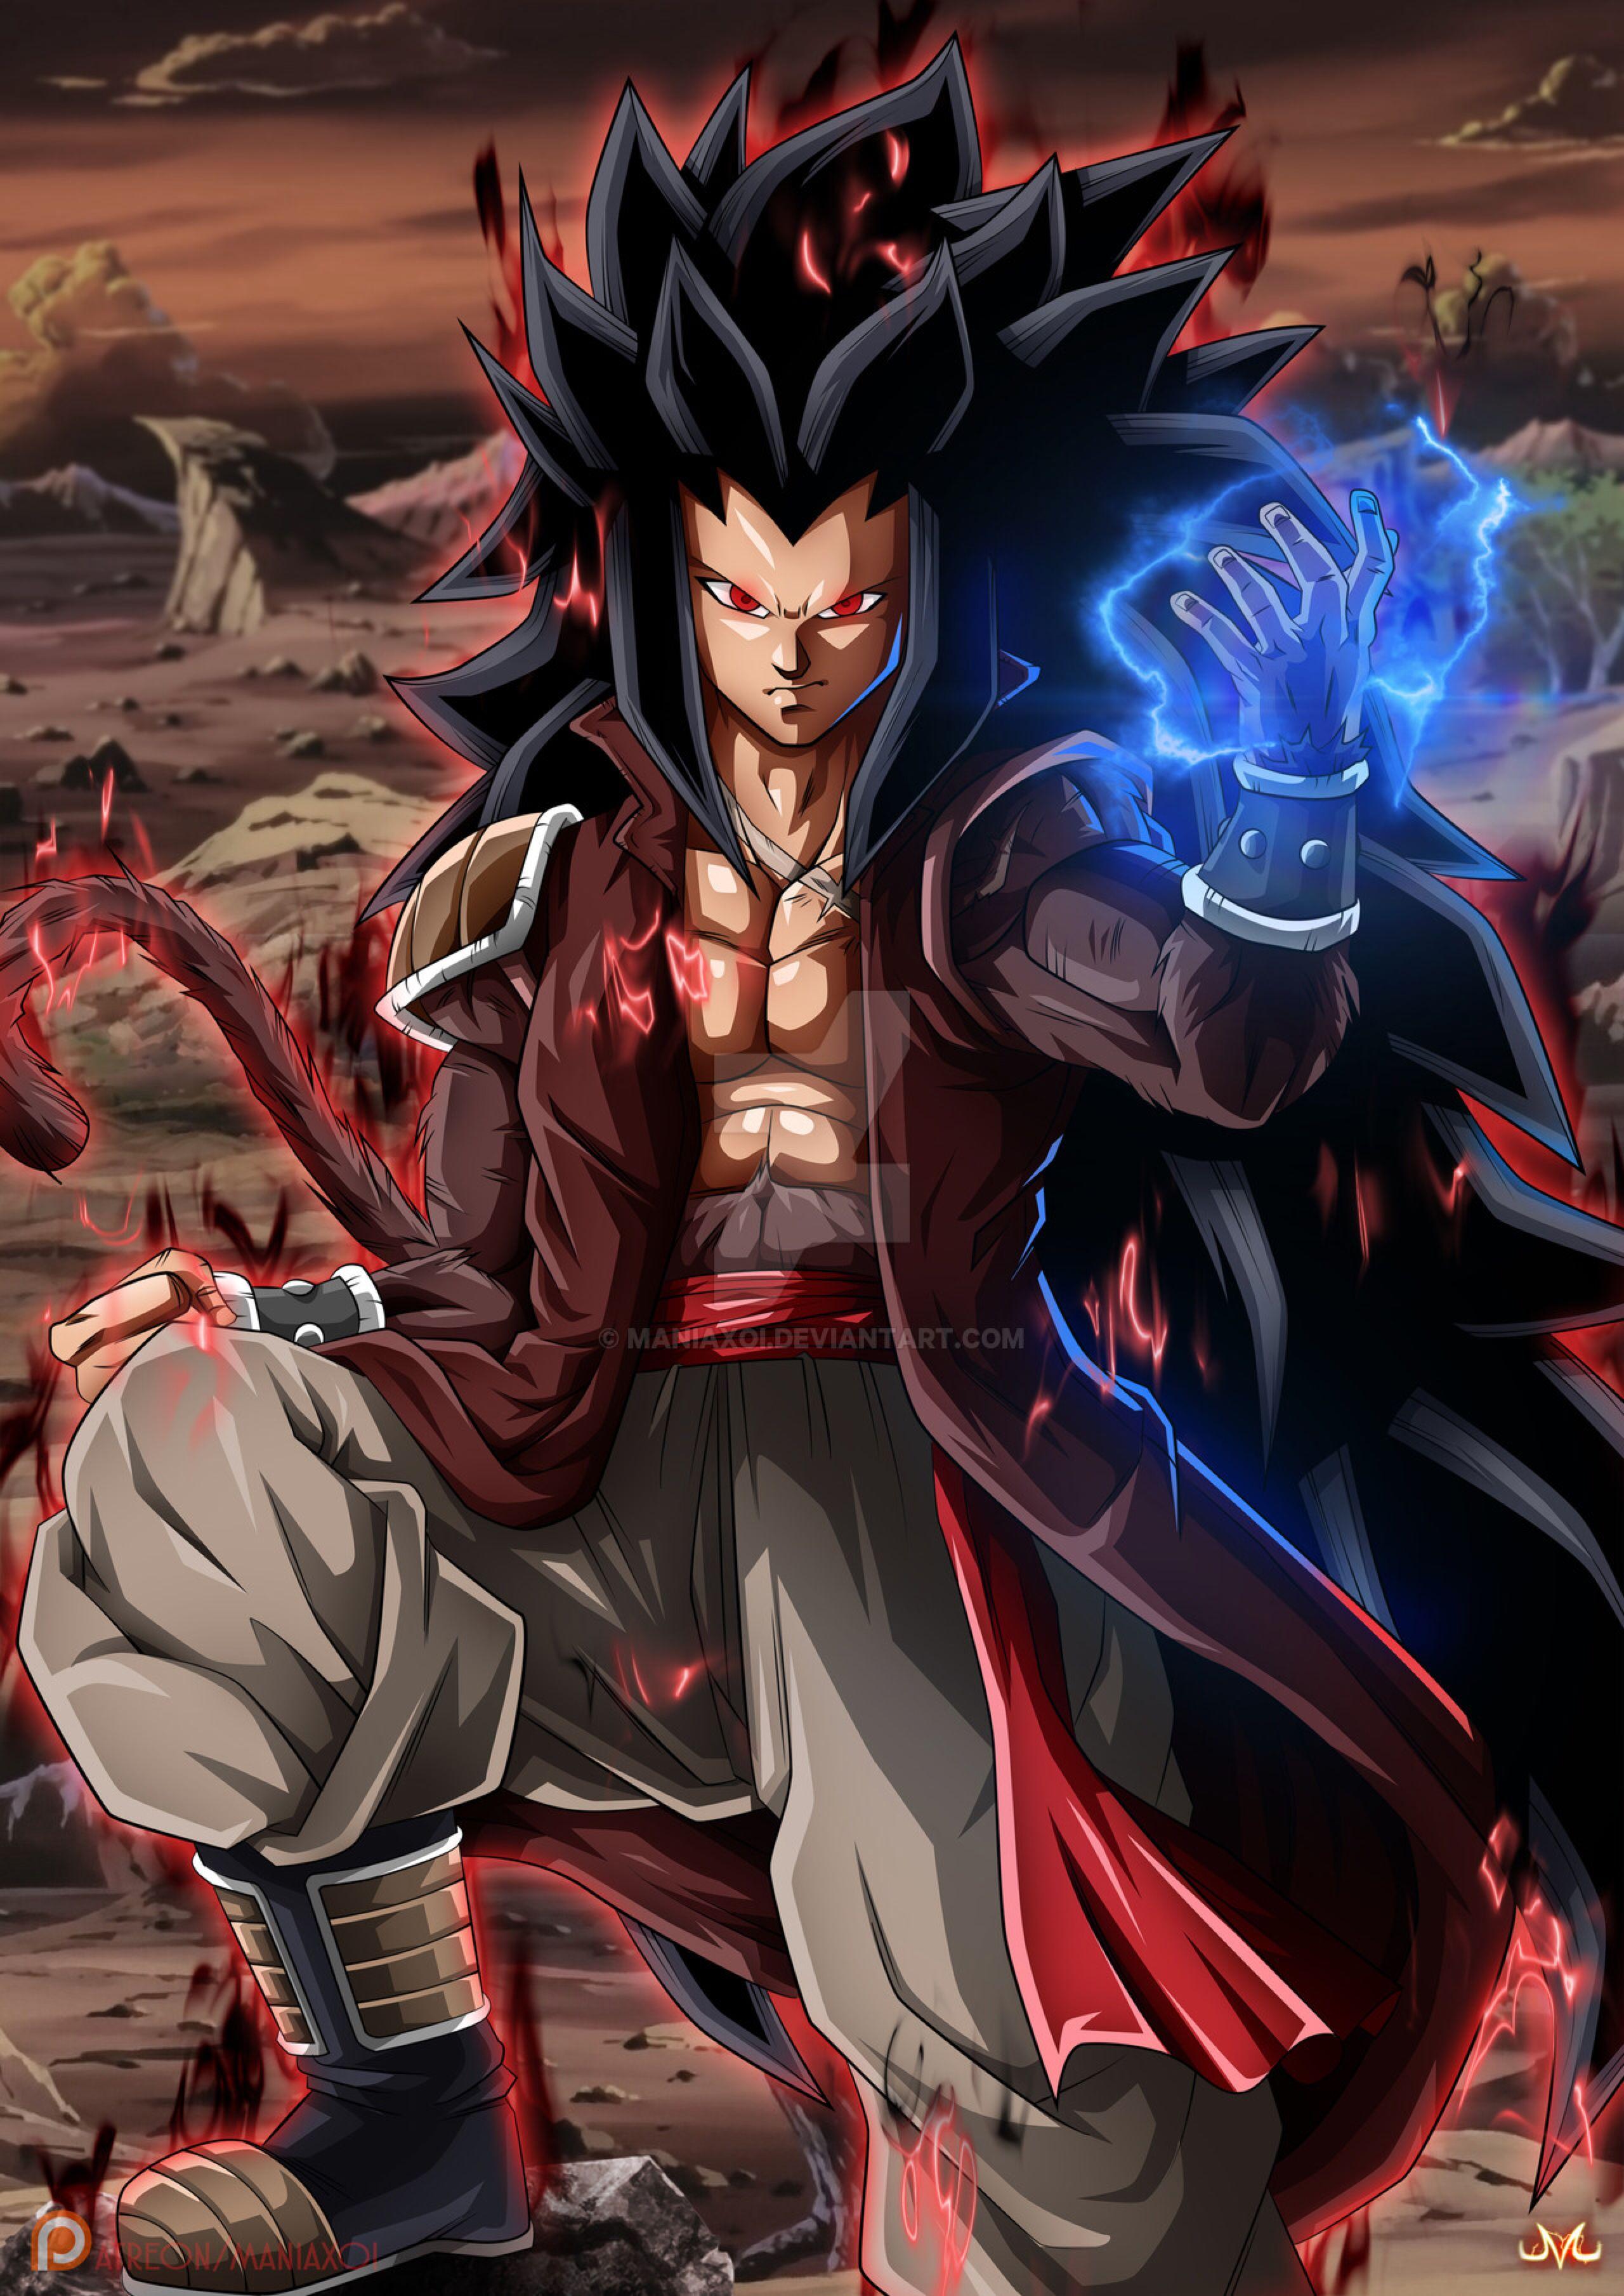 Oc Komatsu By Maniaxoi On Deviantart Anime Dragon Ball Super